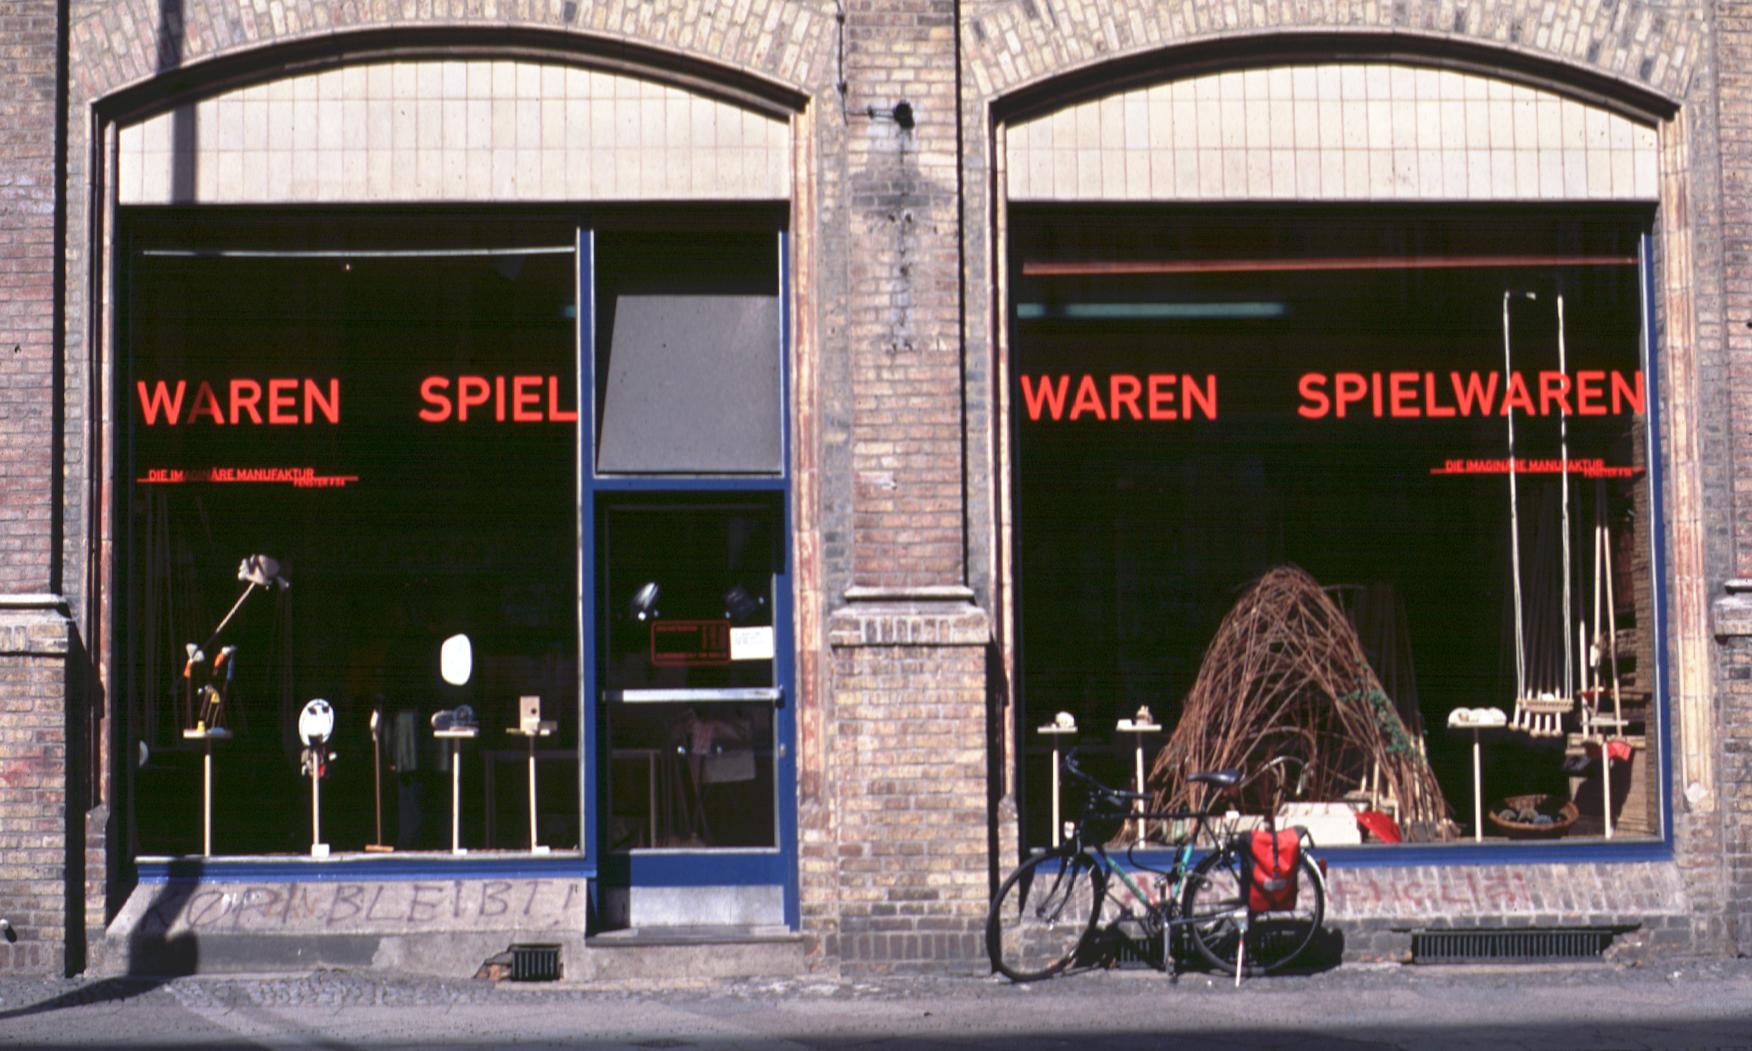 Schaufenster # 03 WAREN SPIEL WAREN SPIELWAREN